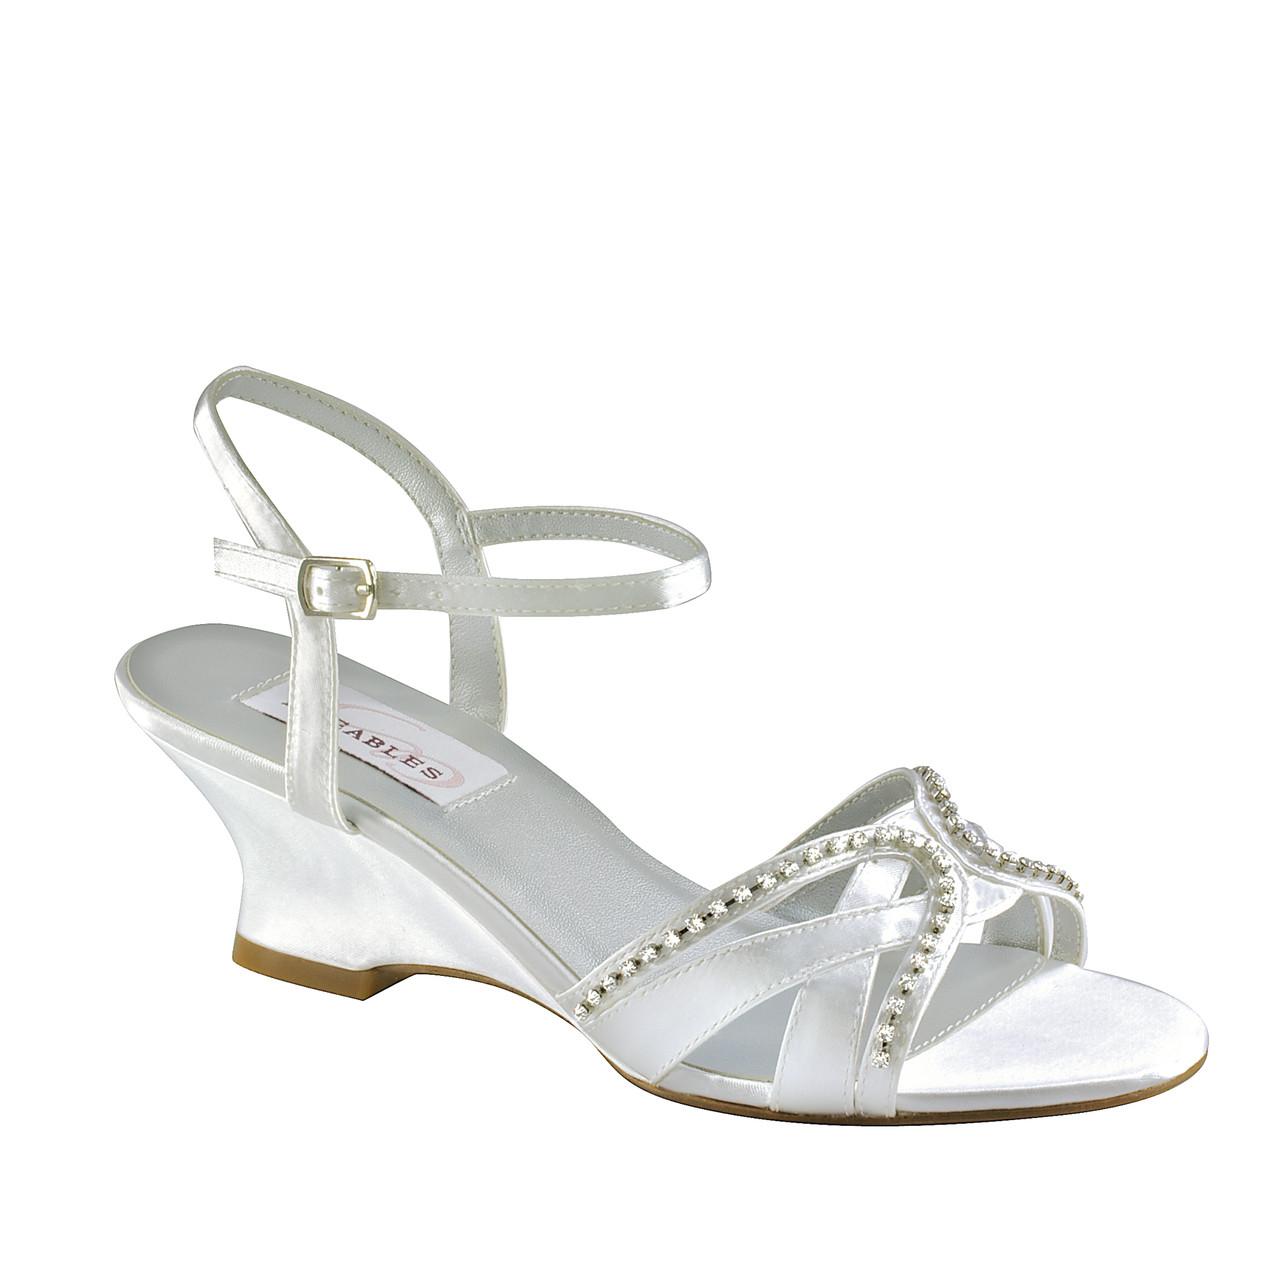 1dc28febd3 Dyeables Women's Peg Wedge Sandal - ShoeMars.com